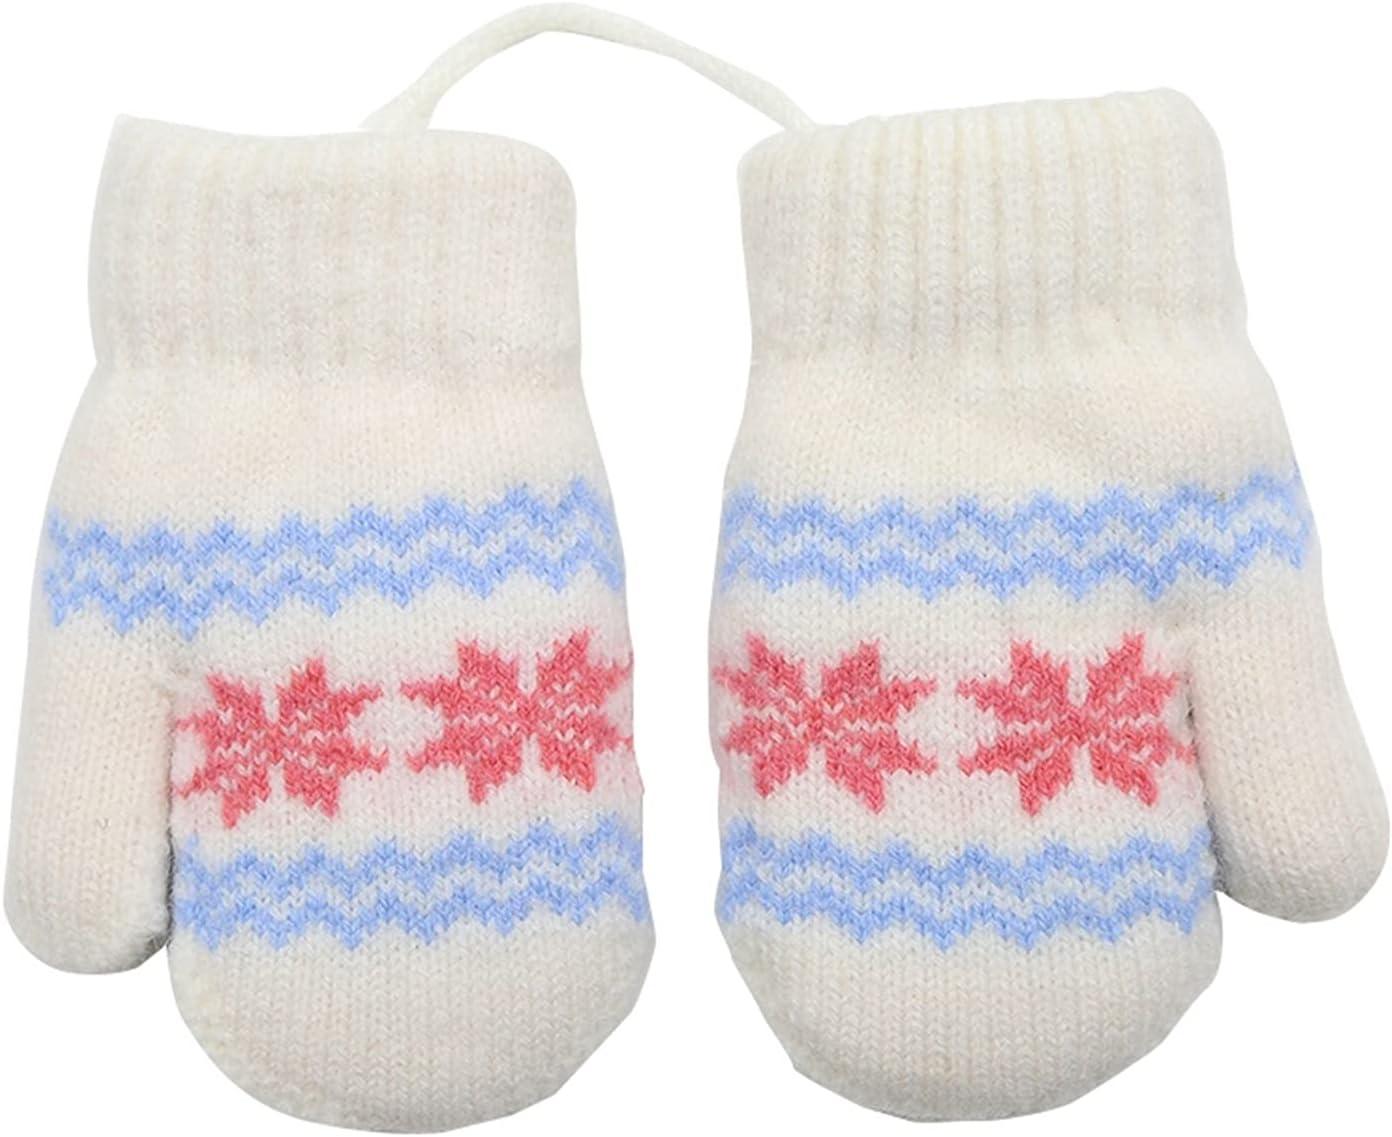 YSJJSQZ Winter Gloves Winter Kids Gloves New Children's Small Snowflake Thick Warm Knitted Mittens Newborn Baby Gloves Mittens (Color : White)